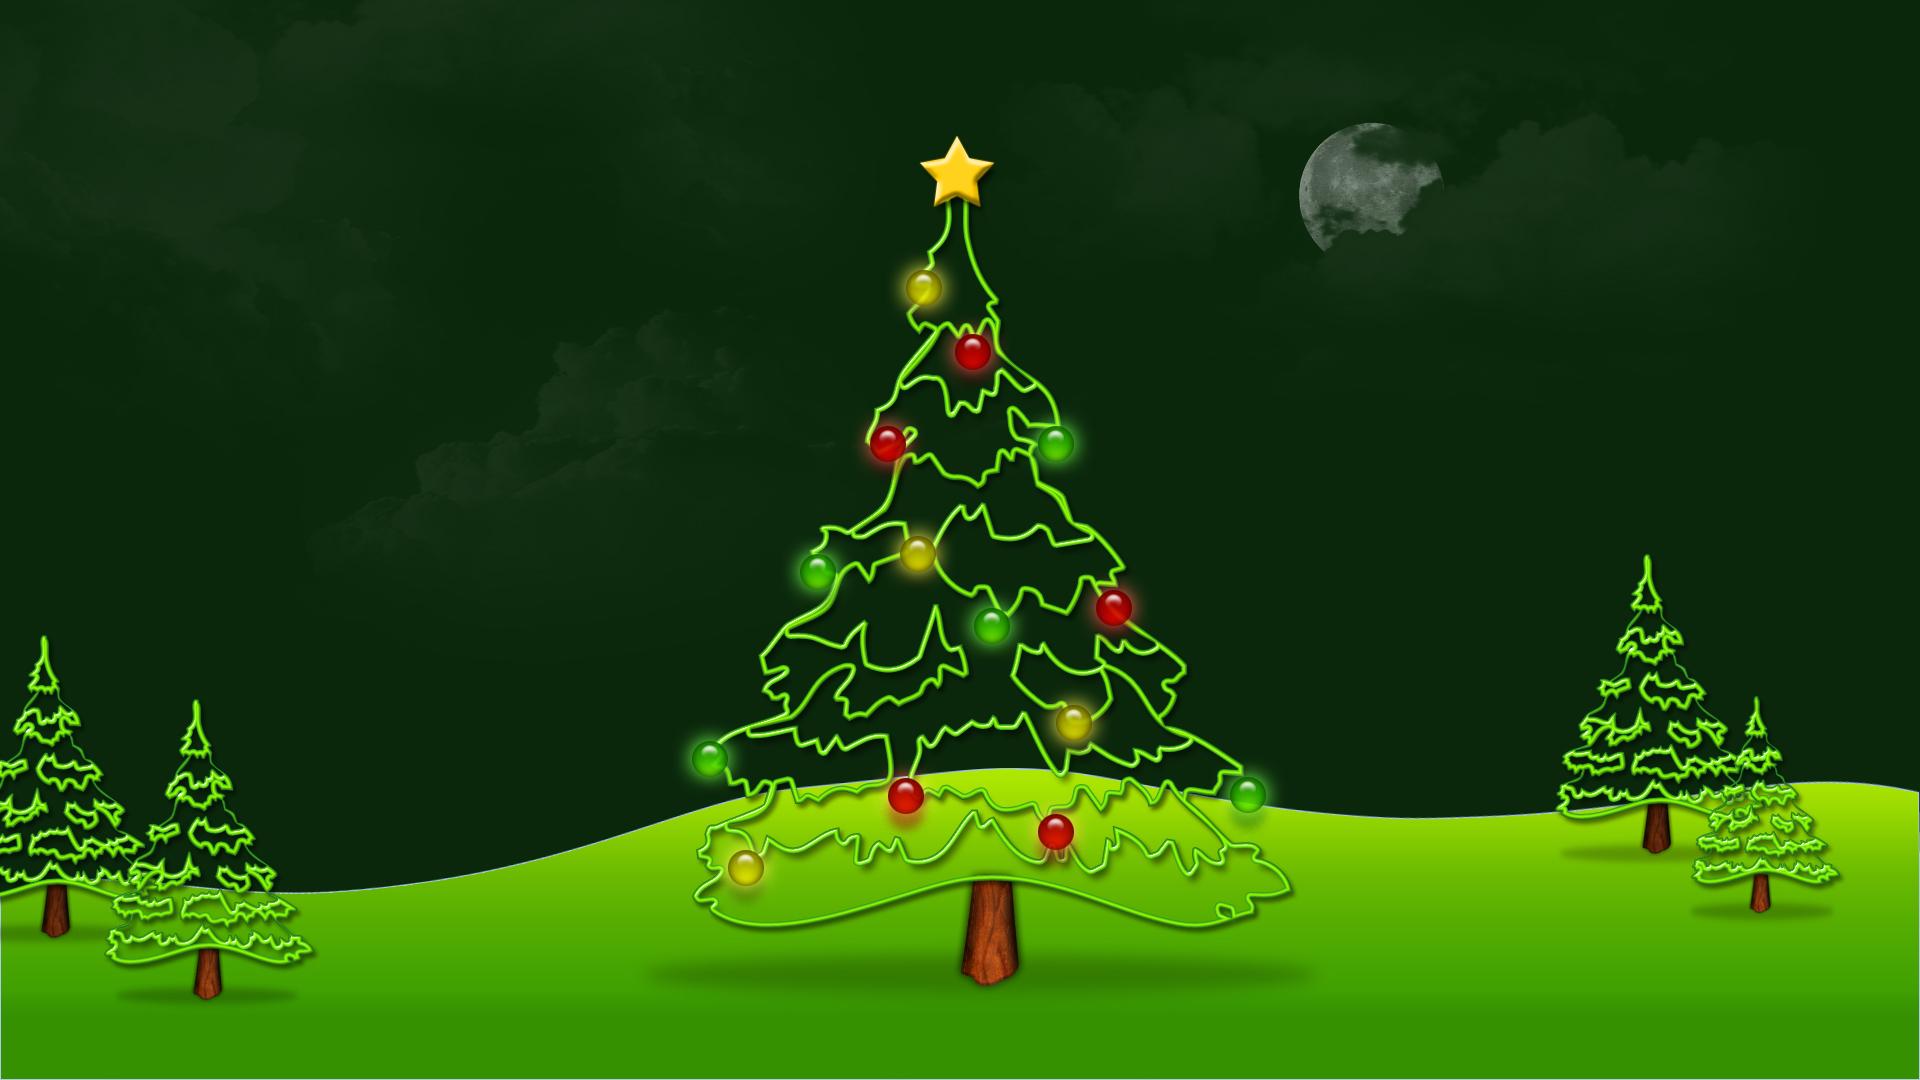 Free Animated Christmas Wallpaper for Desktop (2)